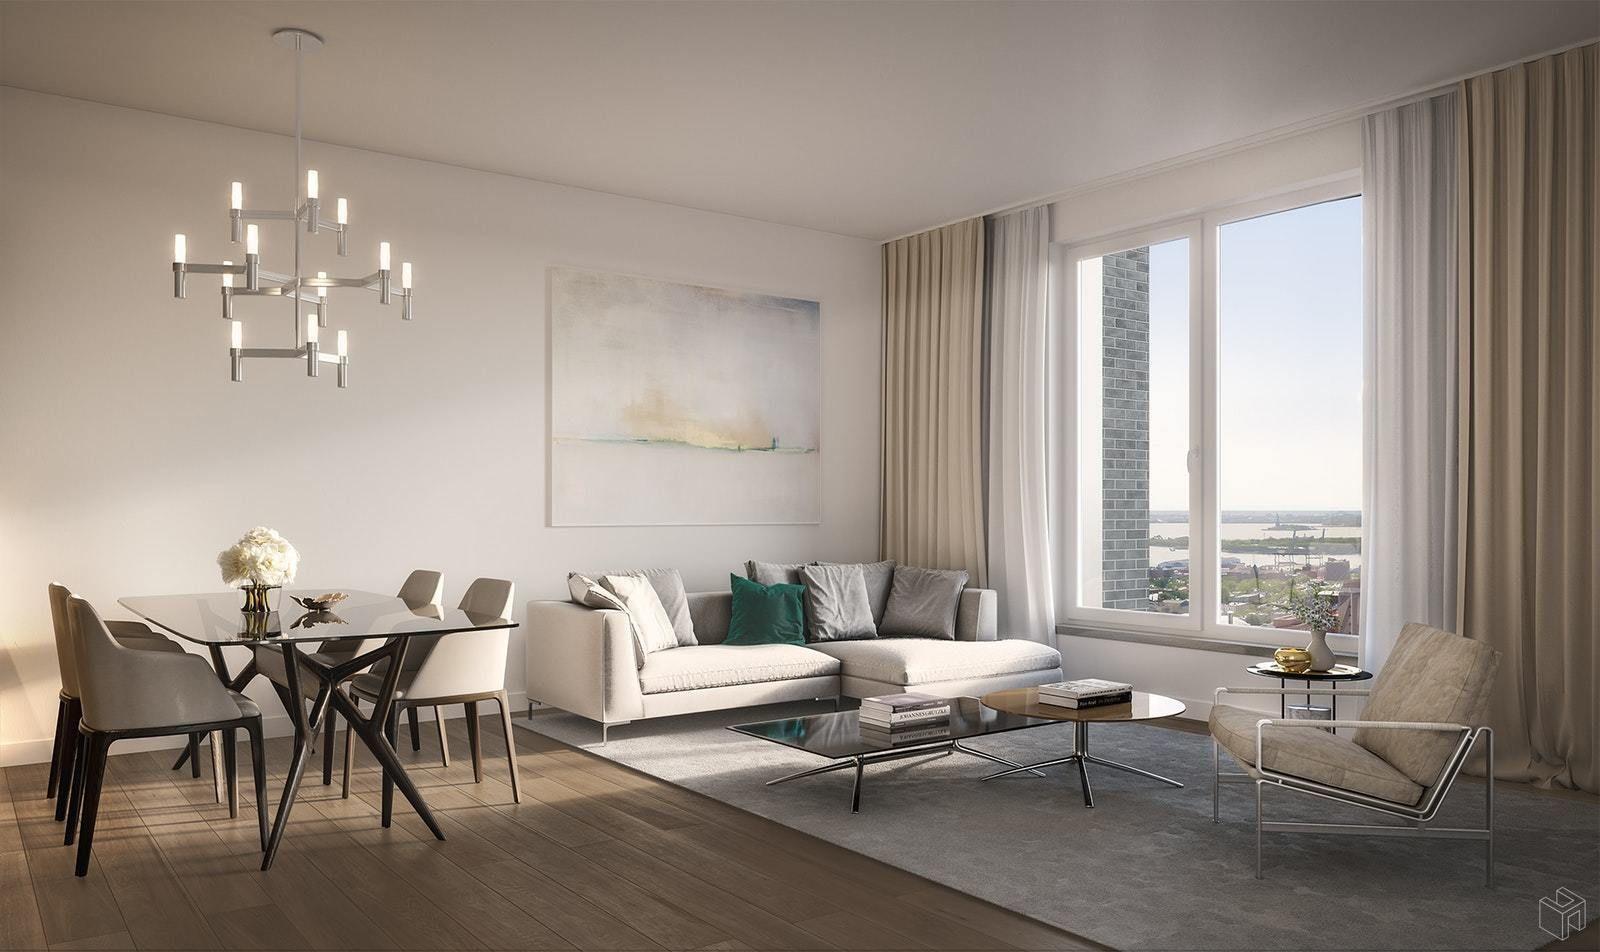 Apartment for sale at 10 Nevins Street, Apt 9C